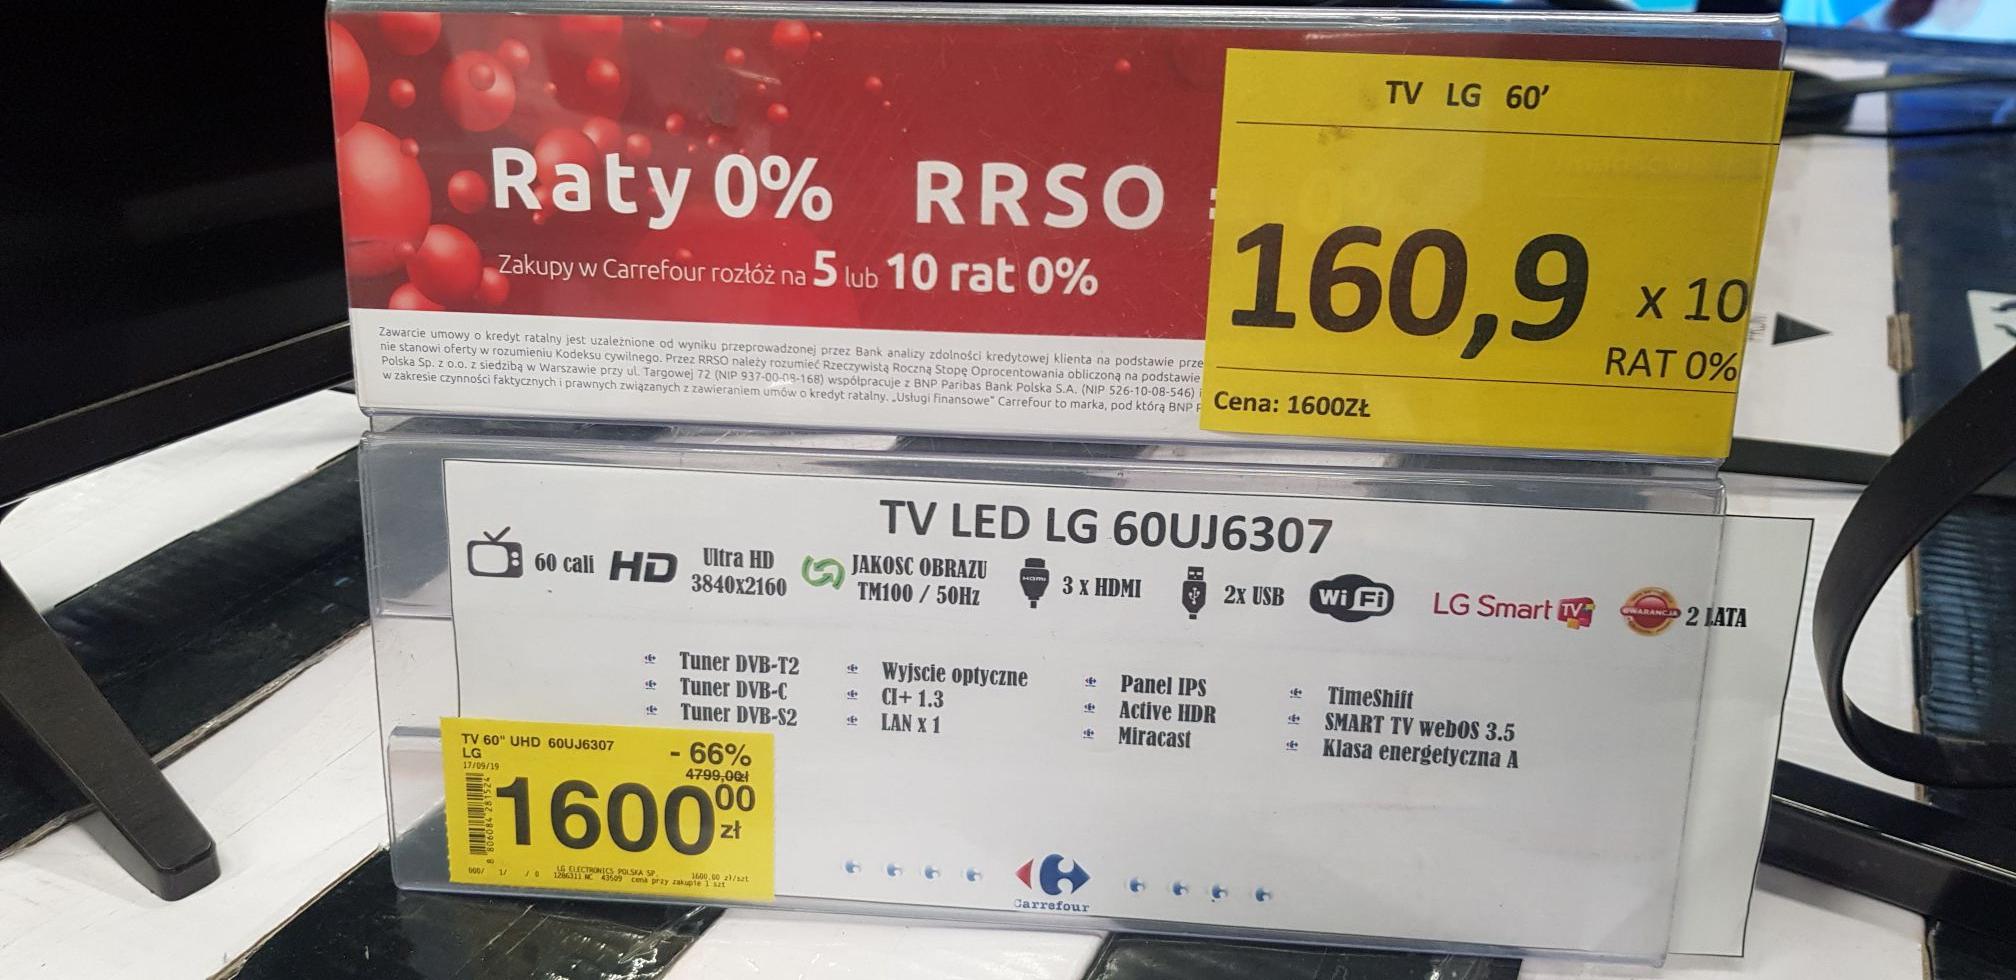 TV LED LG 60UJ6307